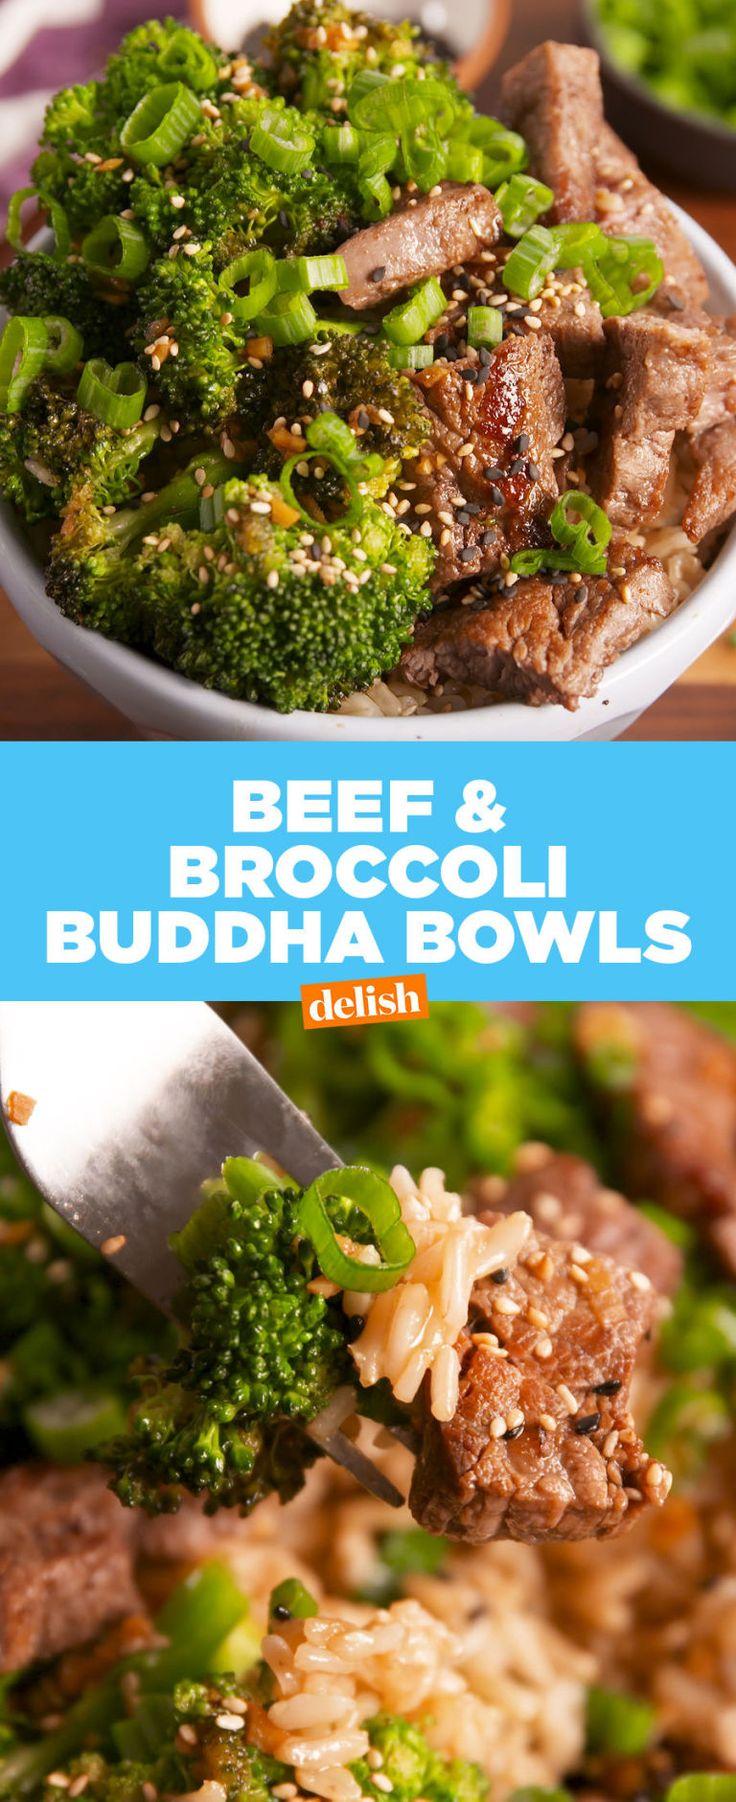 Beef & Broccoli Buddha Bowls